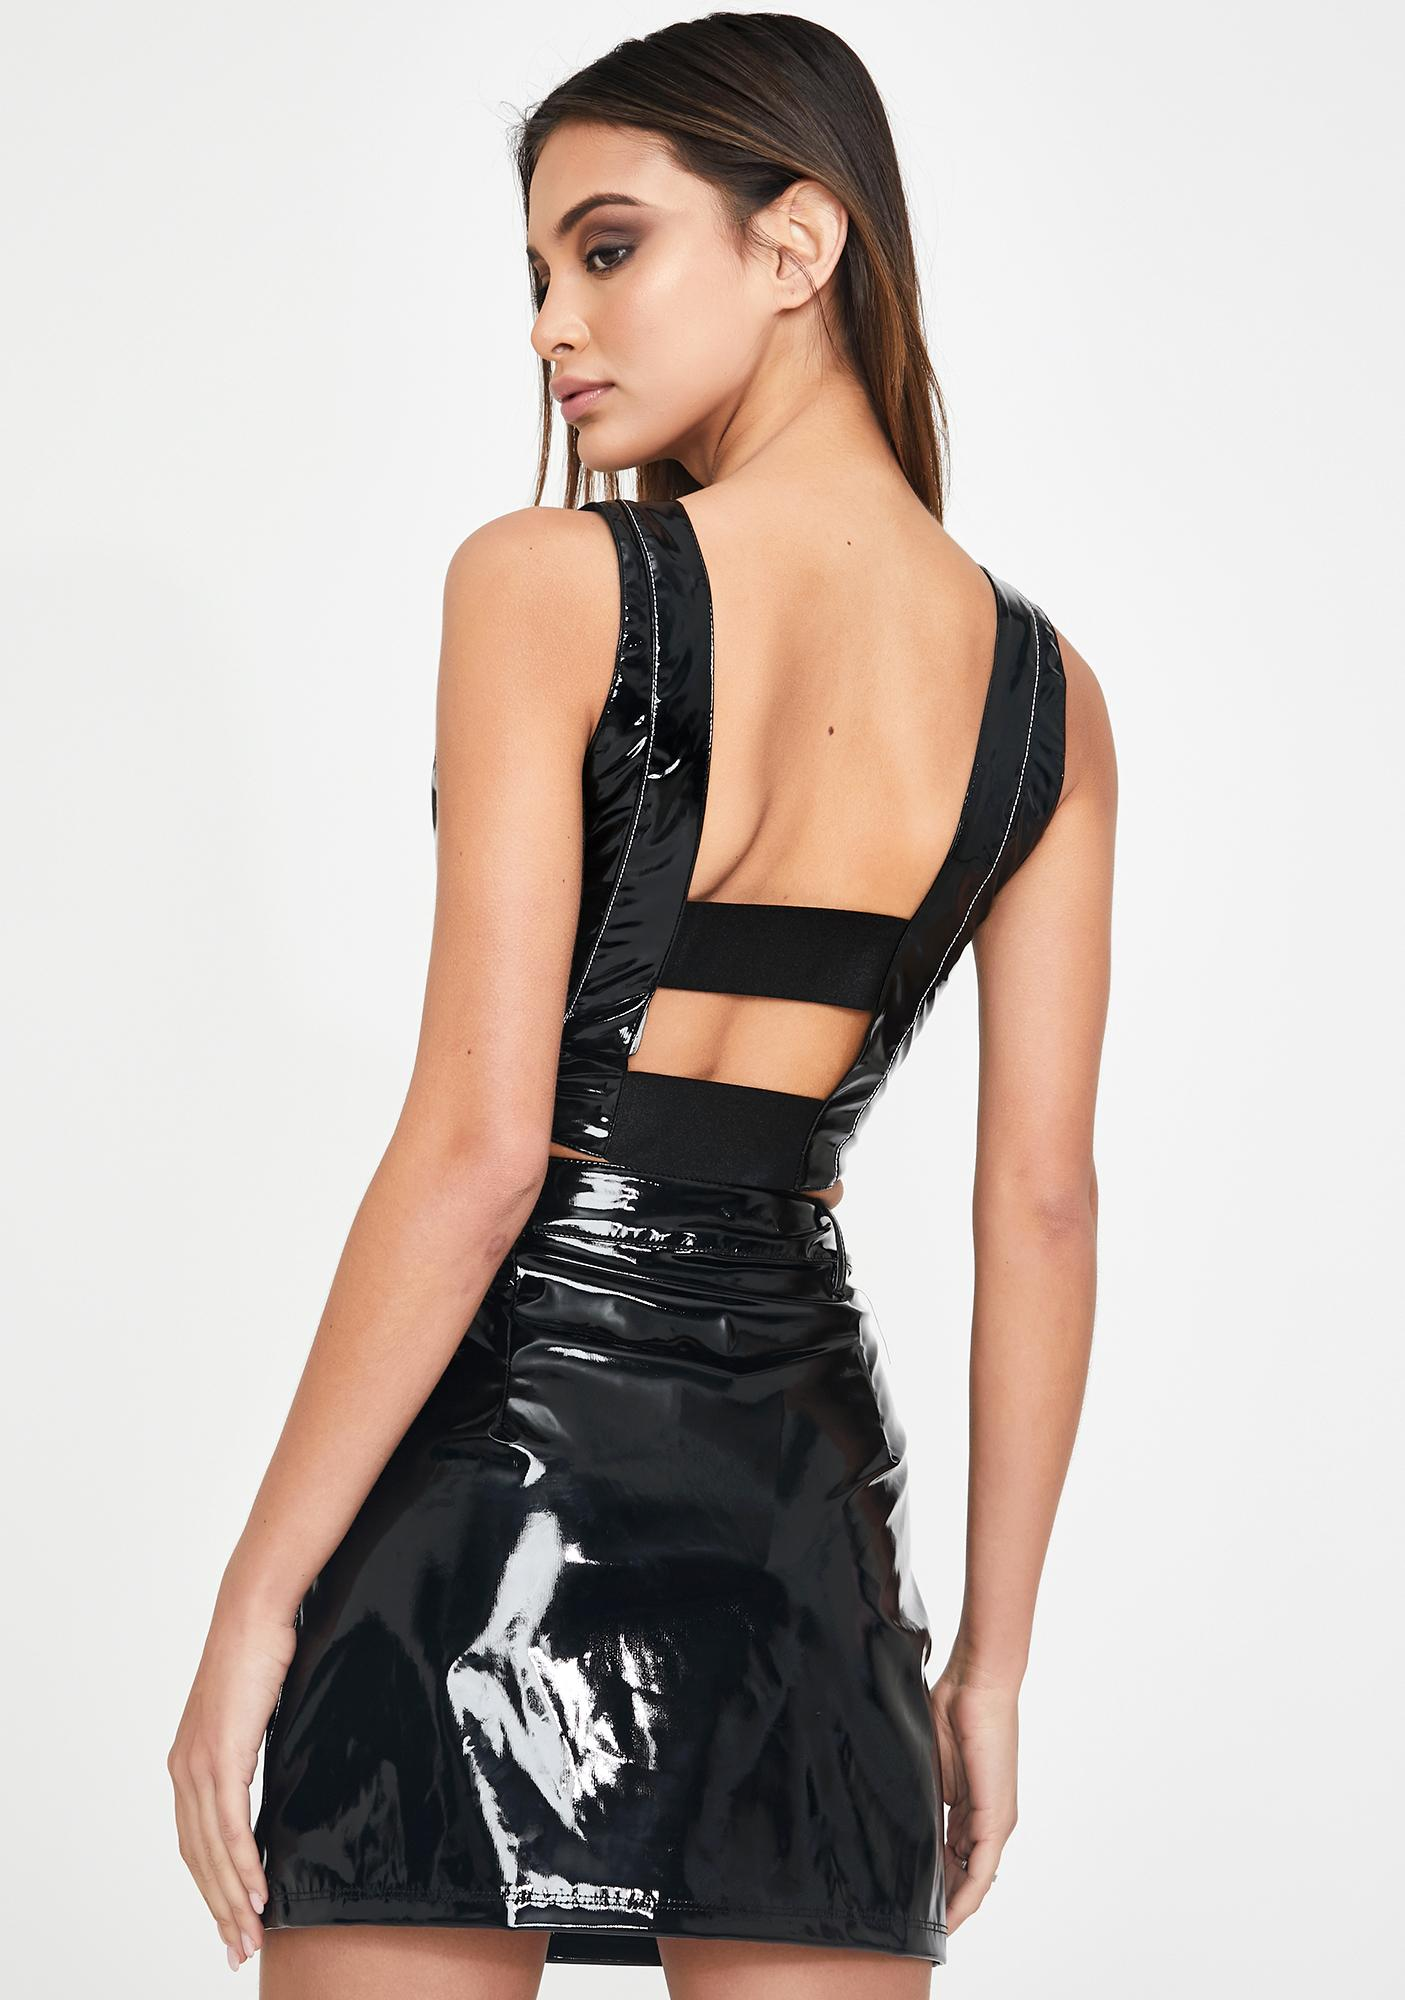 Kiki Riki Reckless Profile PVC Skirt